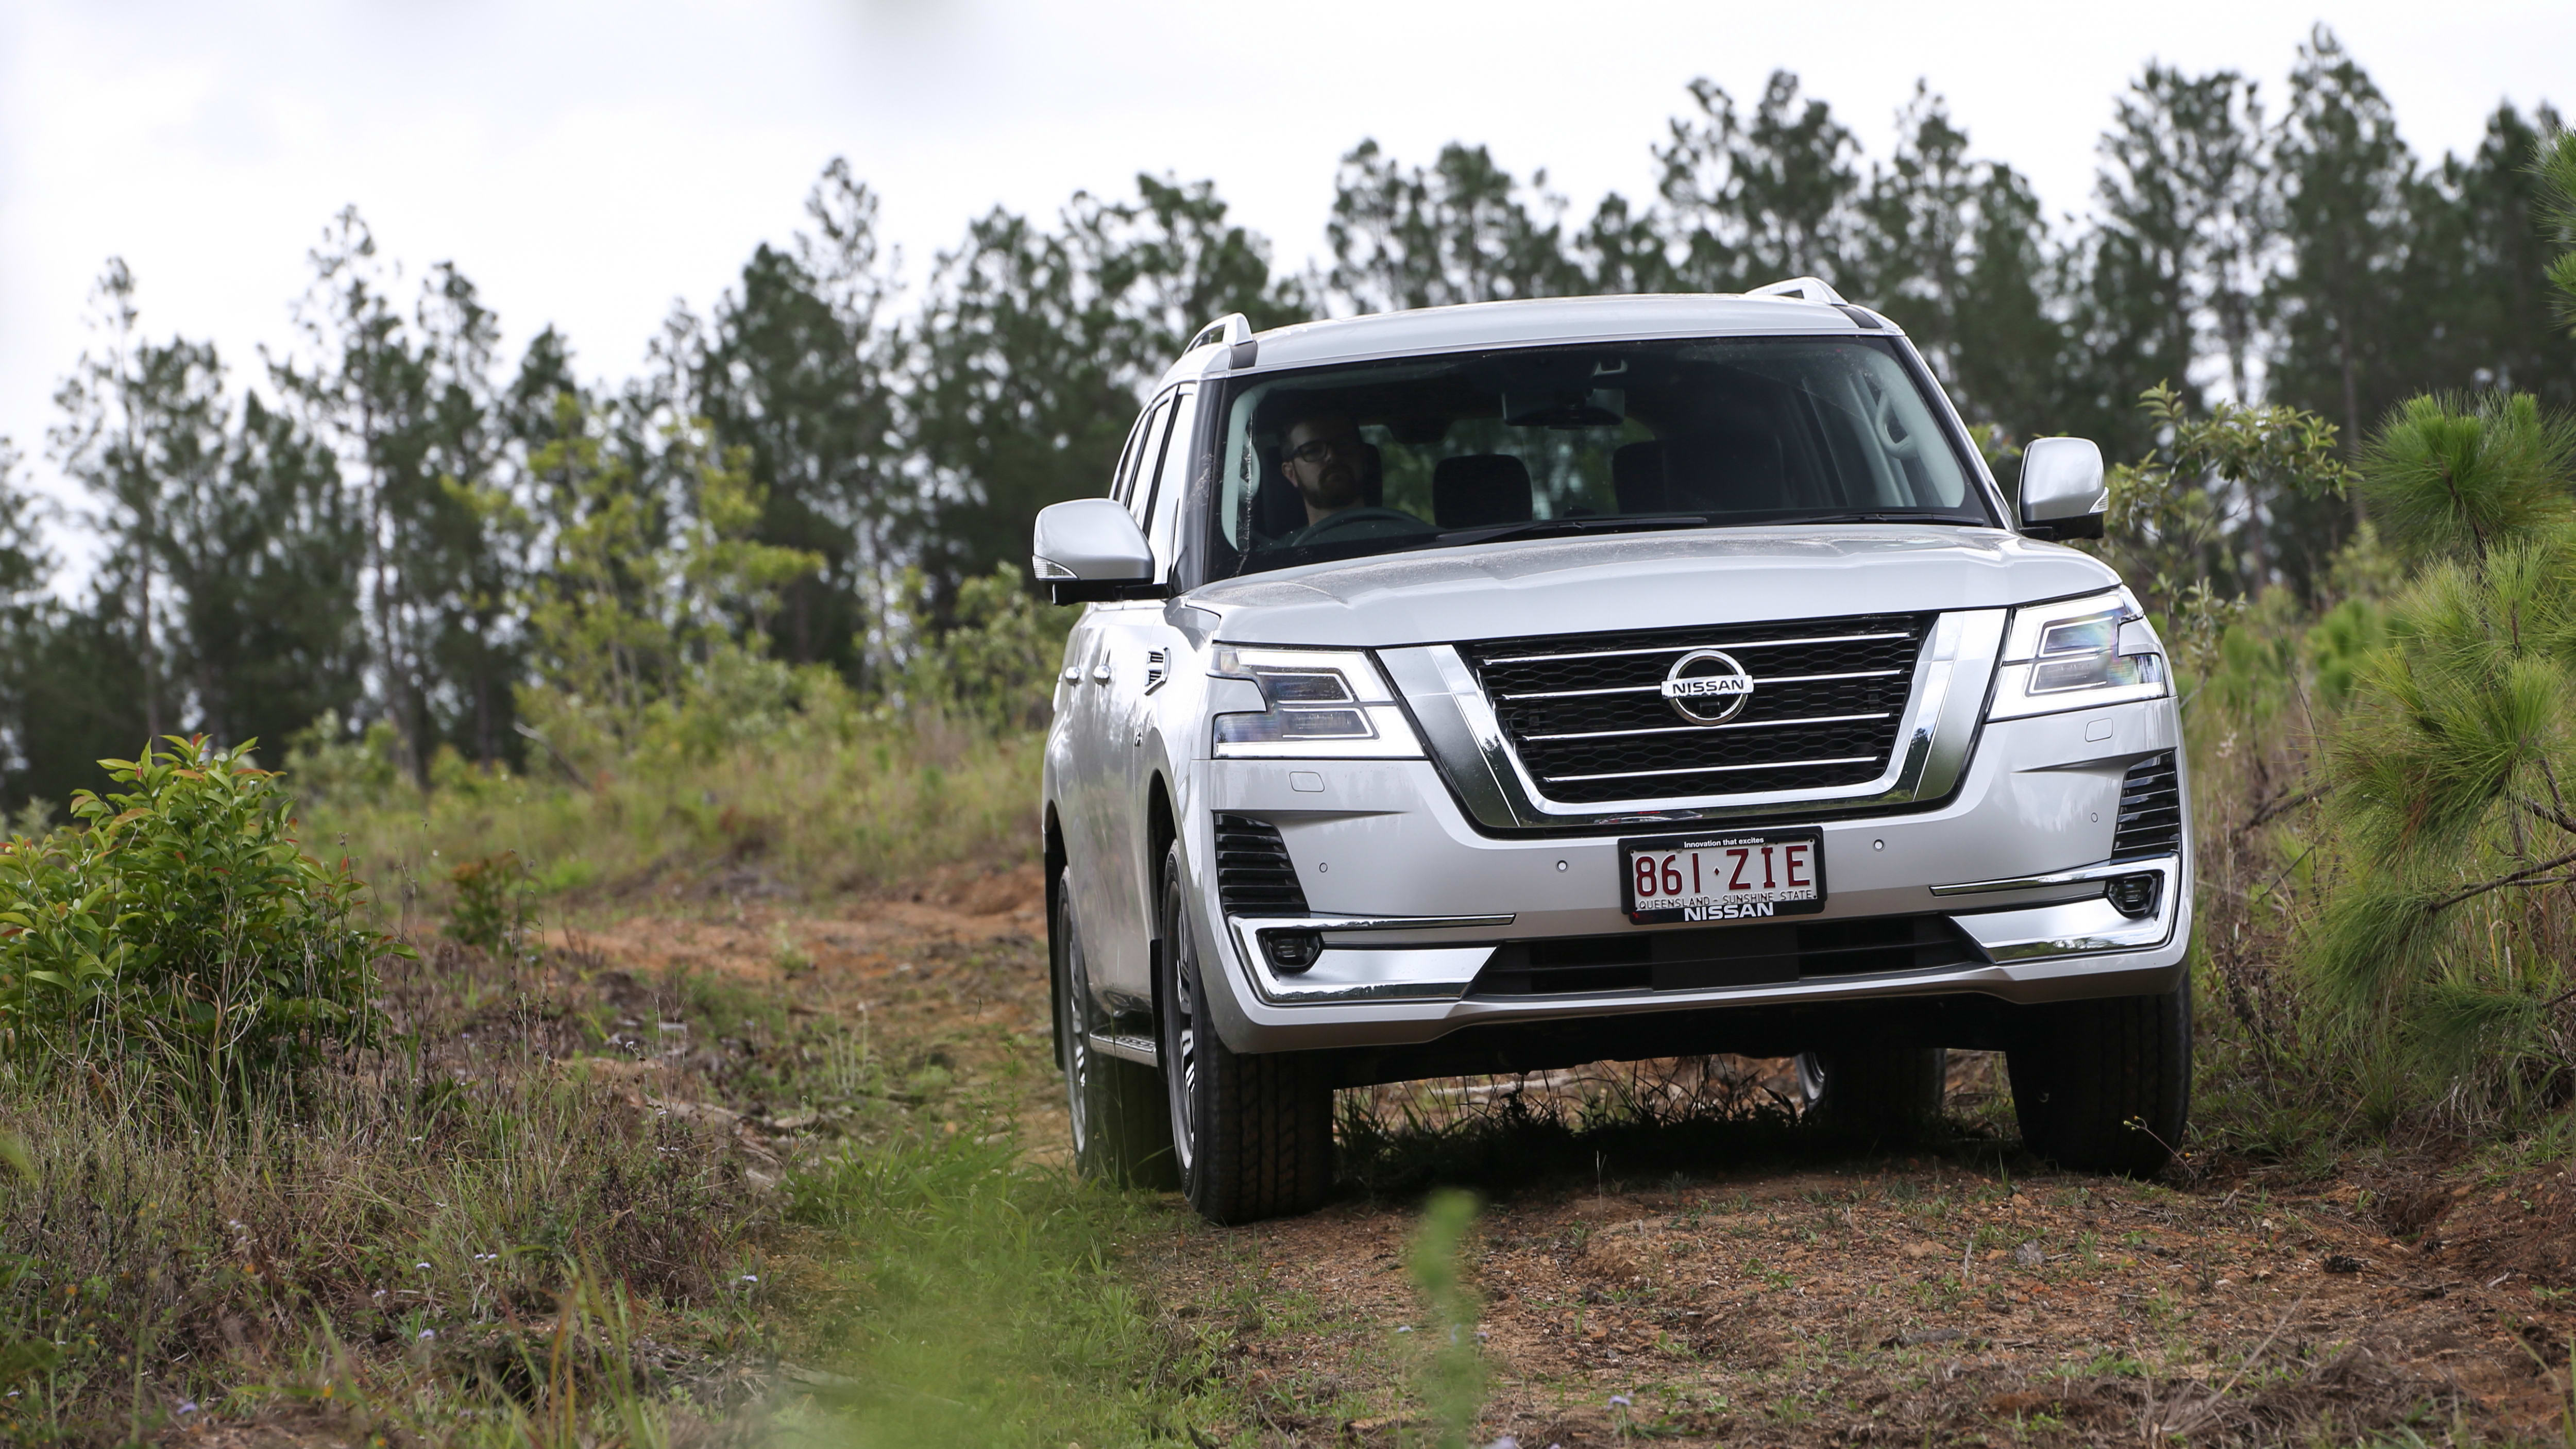 Nissan Patrol Warrior Looking Good For Australia Caradvice